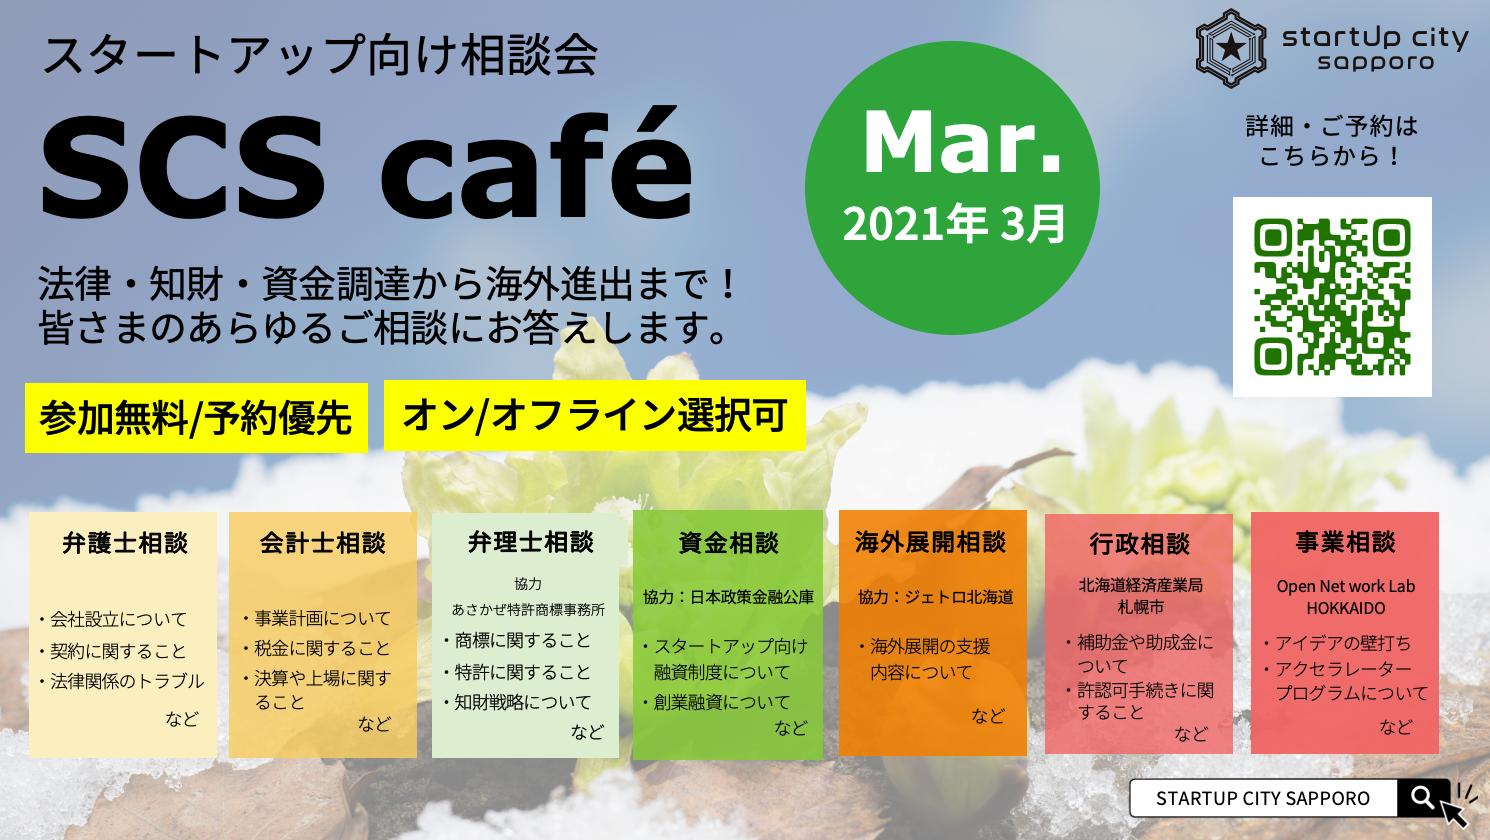 【STARTUP CITY SAPPORO café】3月スタートアップ向け相談会のご案内